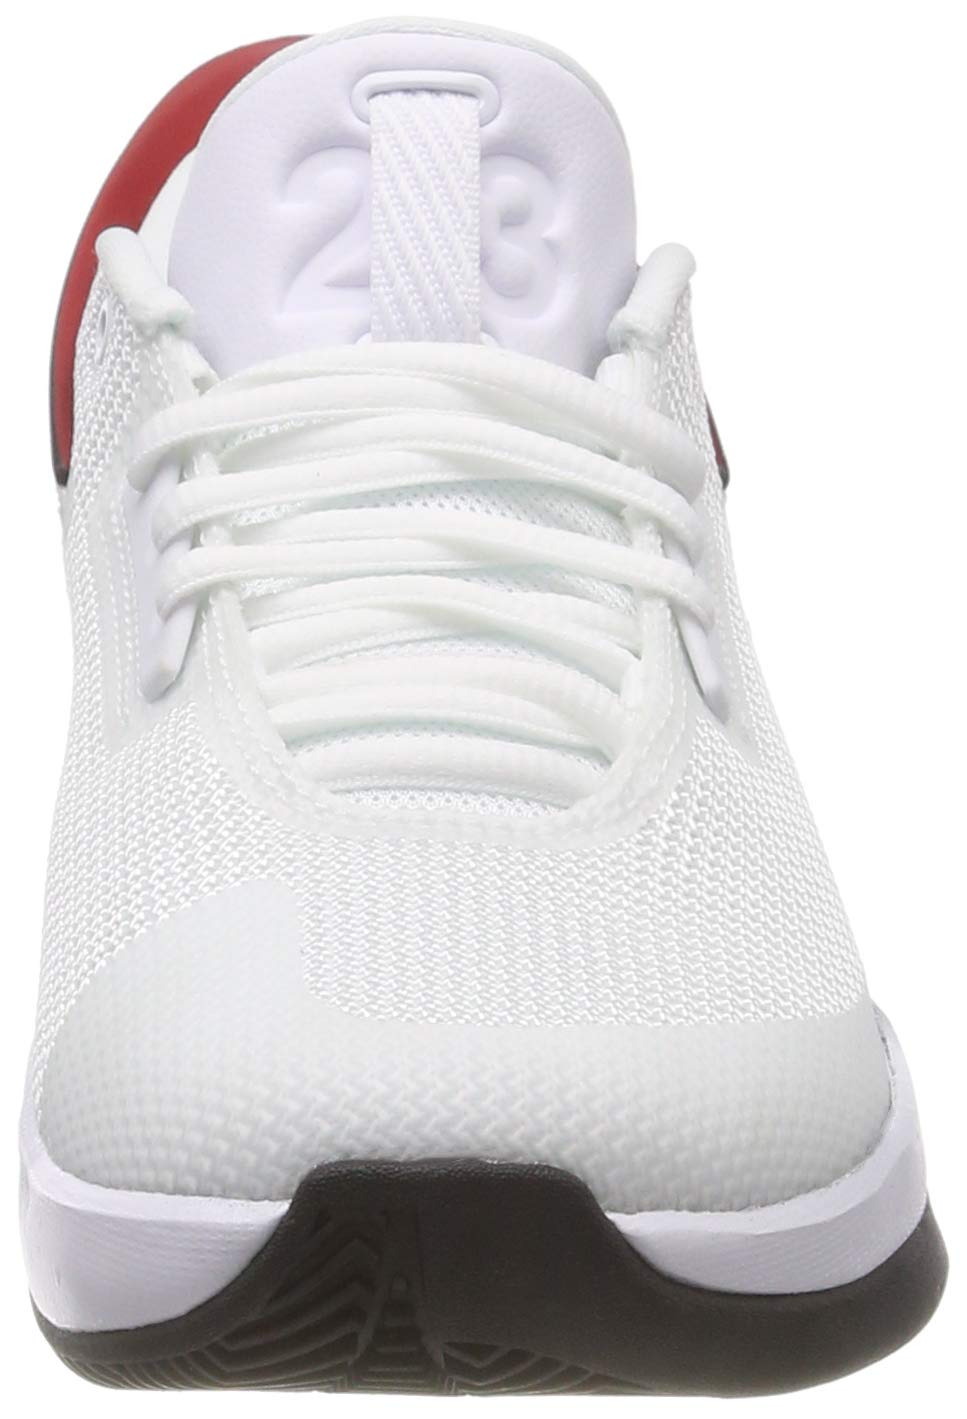 a7651c662351e Nike Unisex Kids  Jordan Fly Lockdown (gs) Basketball Shoes